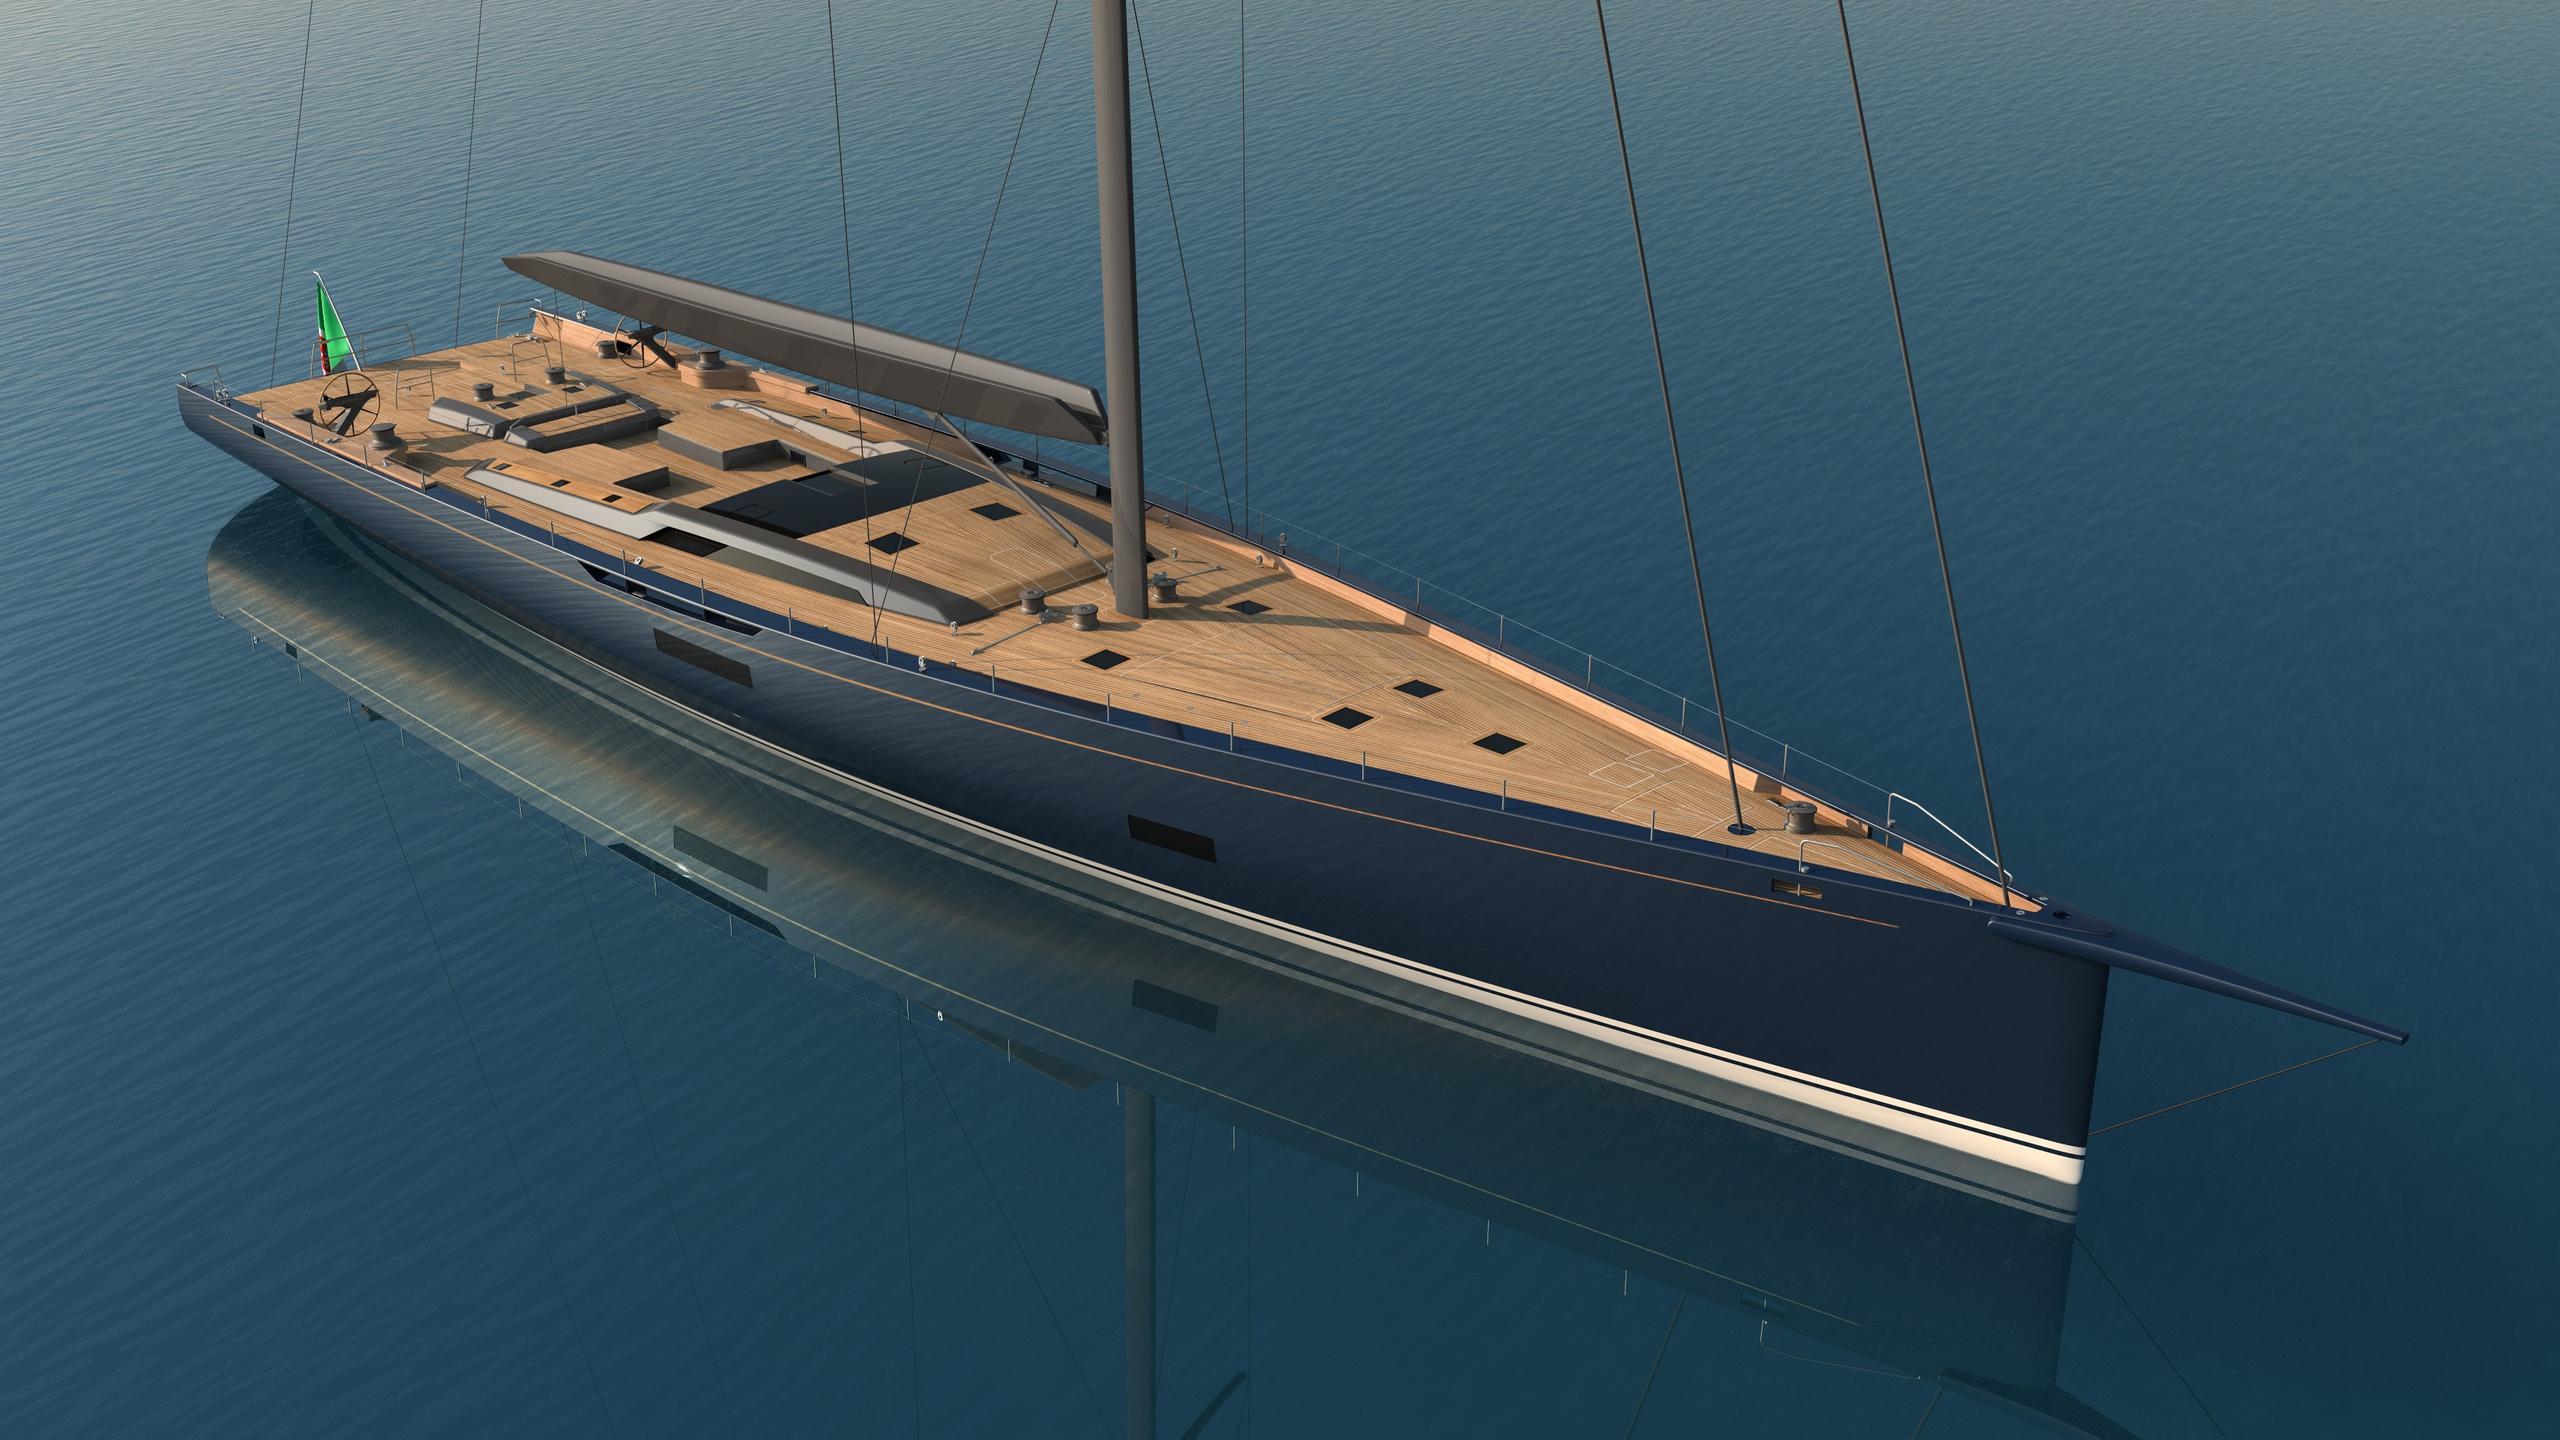 baltic-130-sailing-yacht-2016-40m-rendering